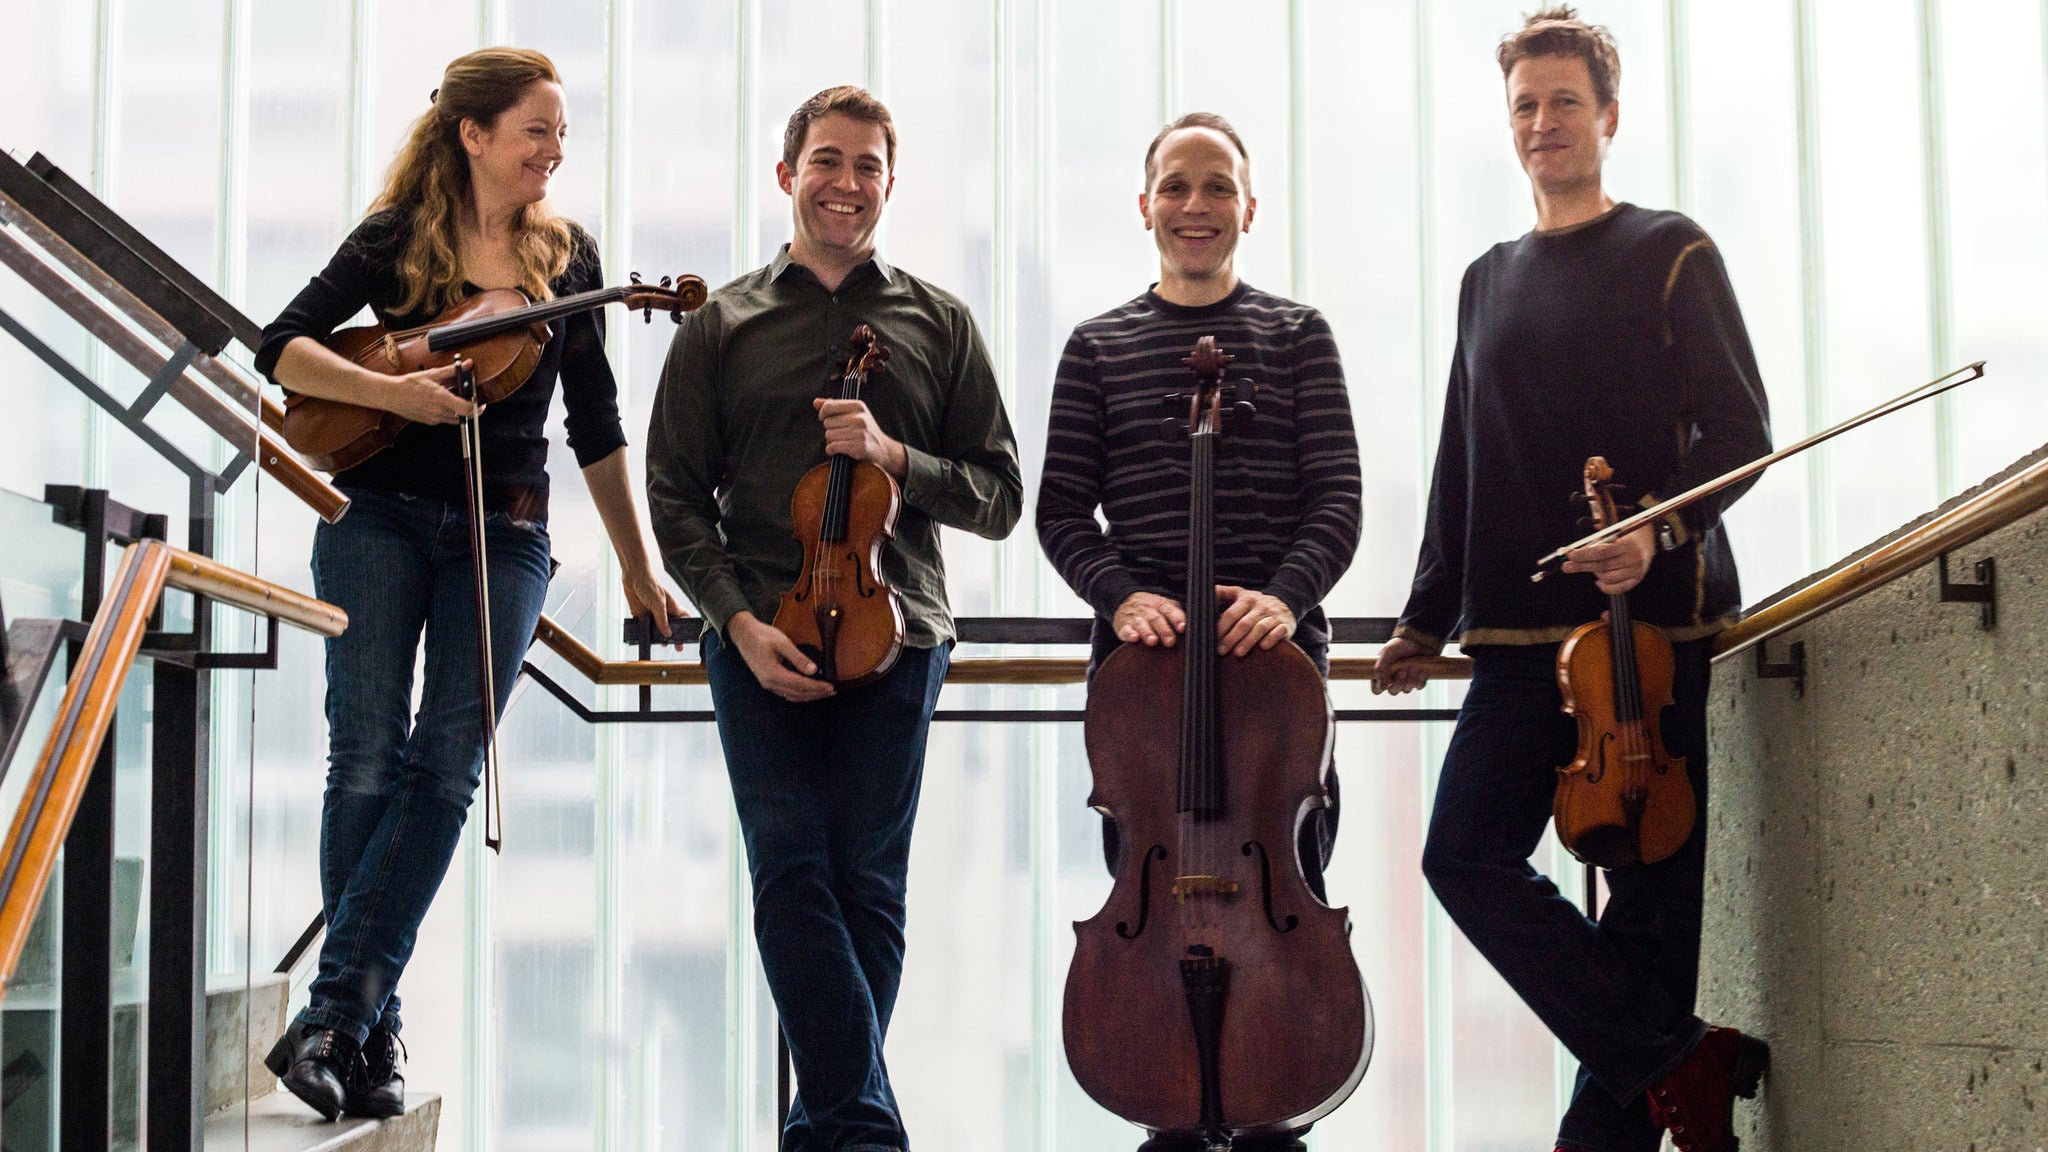 St. Lawrence String Quartet at Valley Performing Arts Center - Northridge, CA 91330